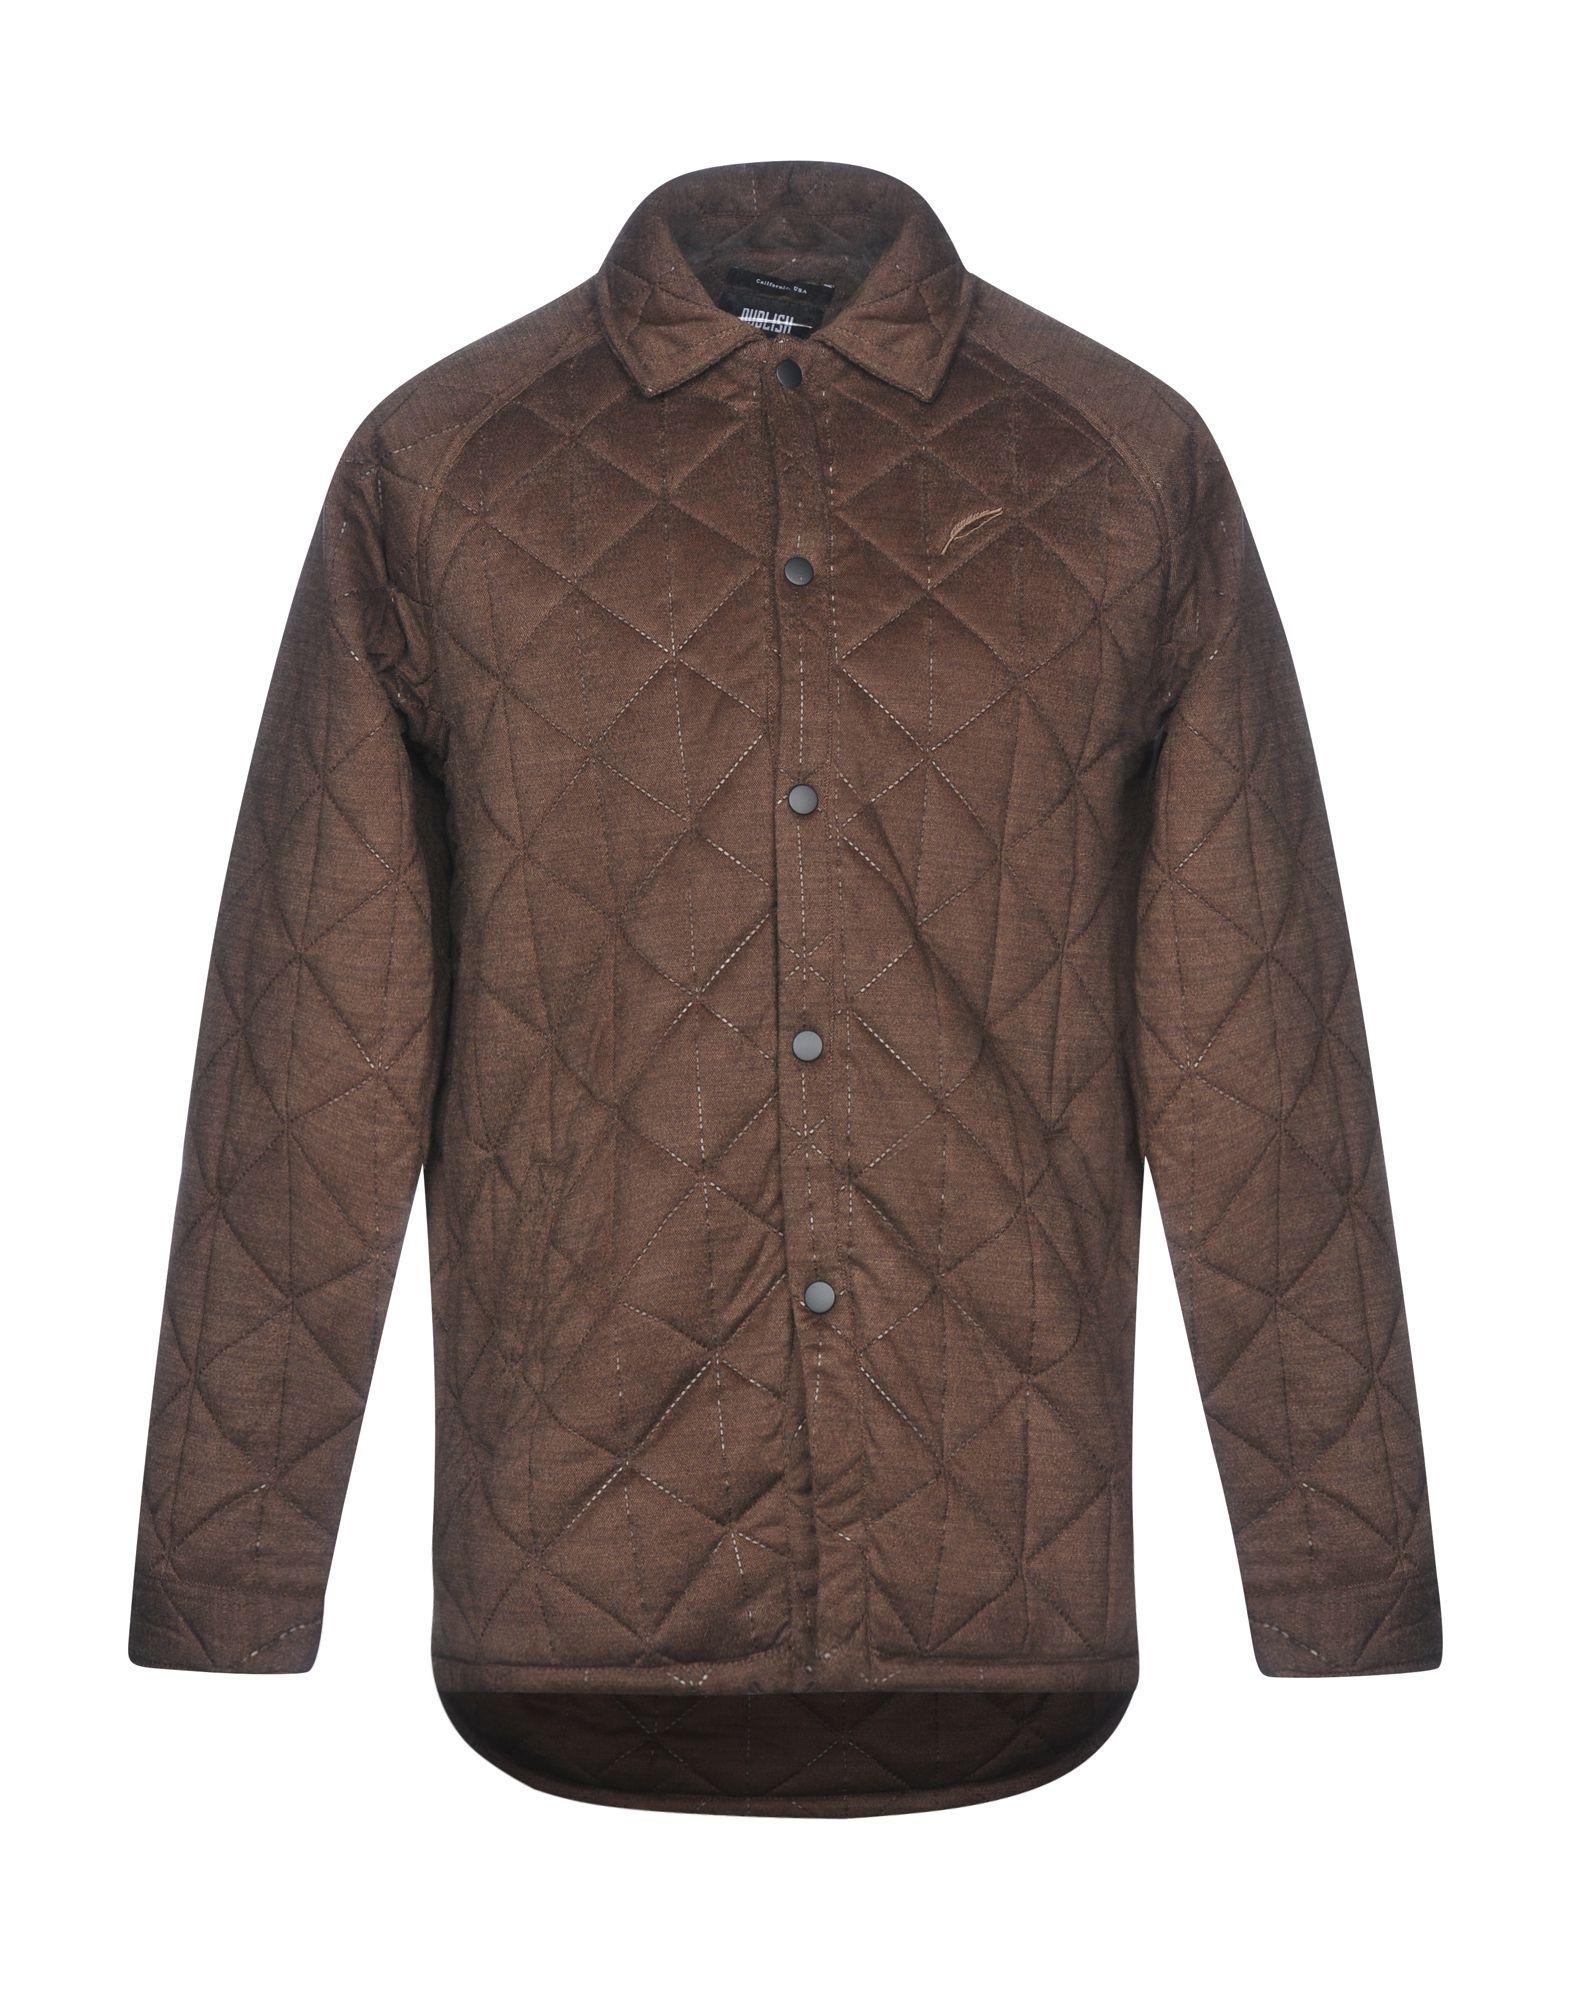 PUBLISH Coat in Dark Brown